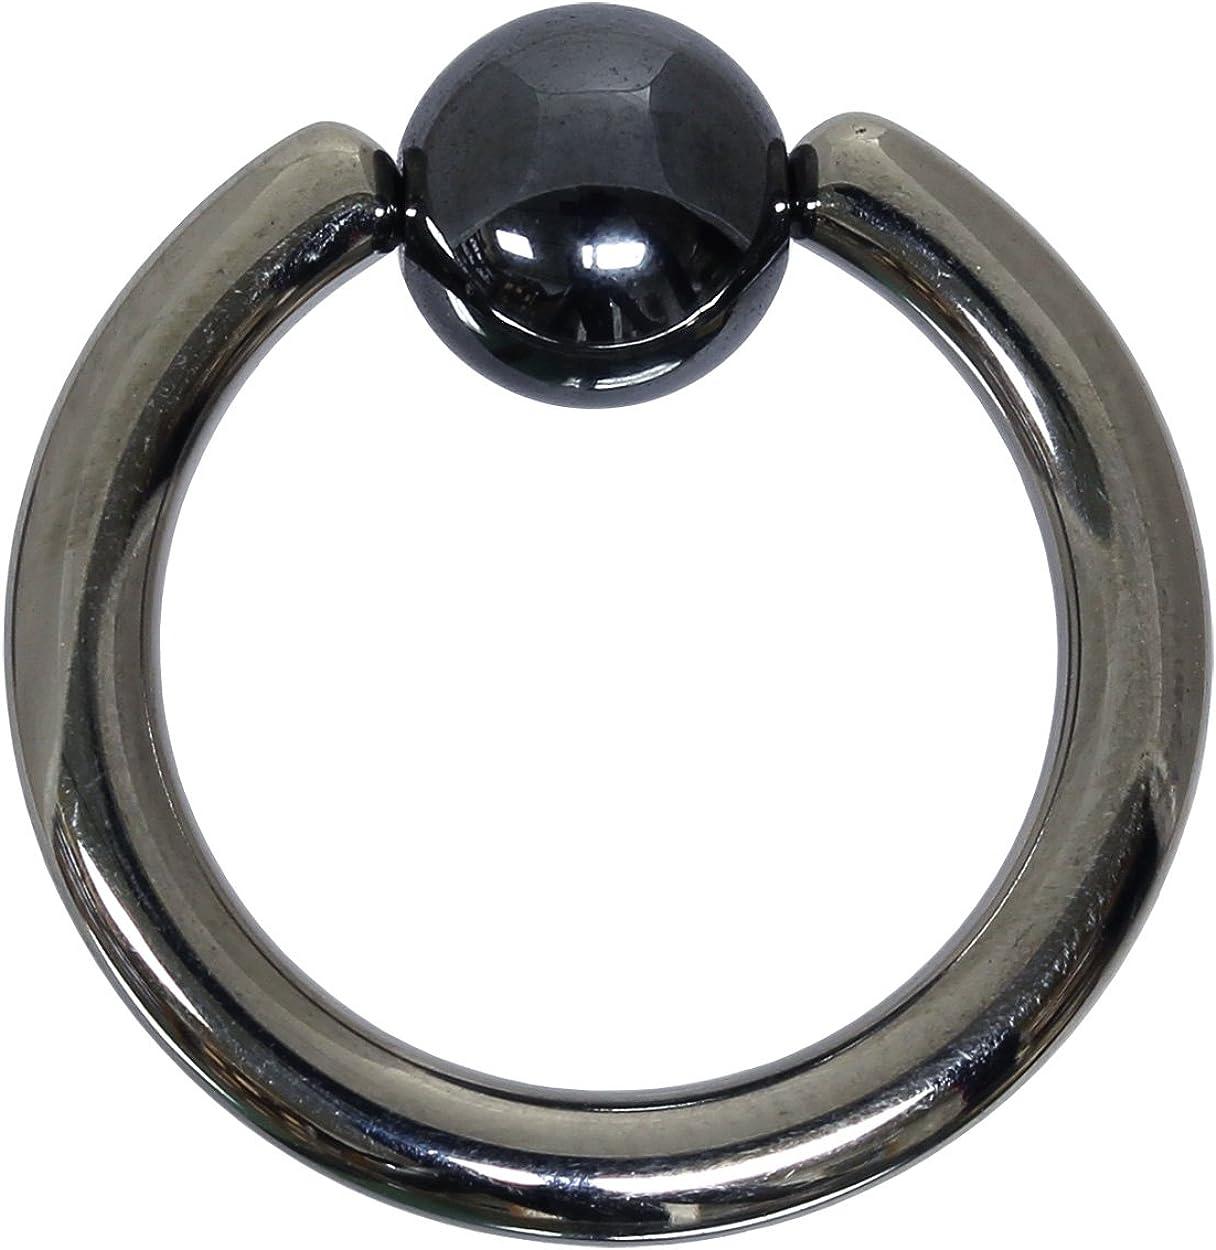 Piercing Anneau Titane BCR 1,2 mm Doré Fermeture BouleDiamètre 6-12 mm